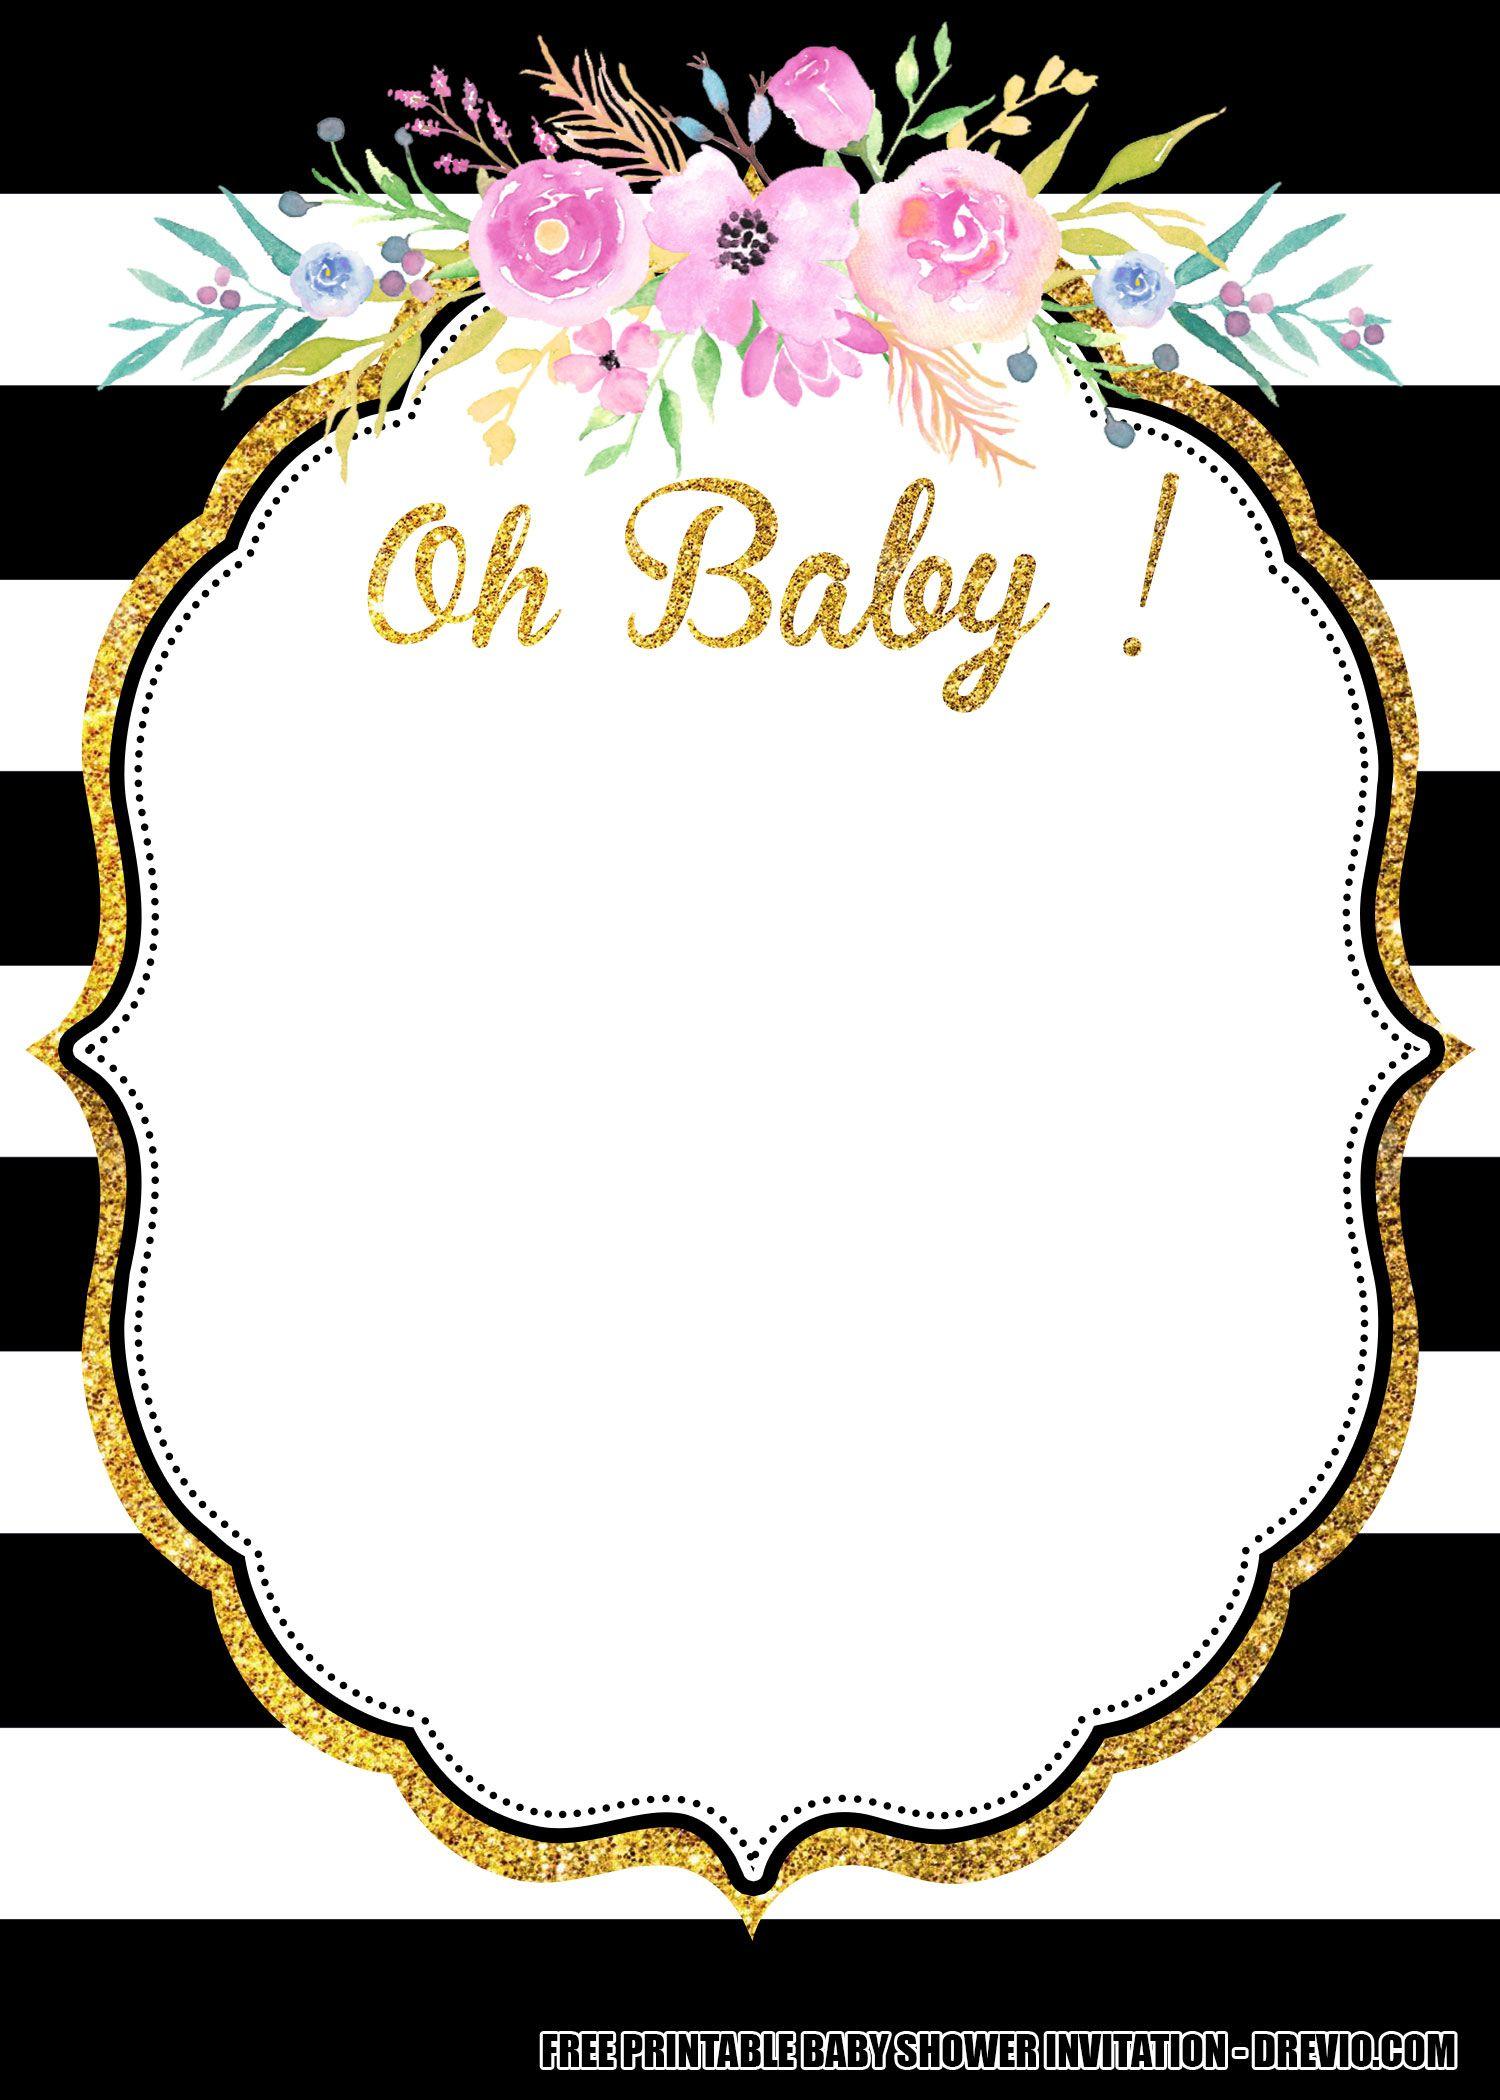 Baby Shower Invitations Templates Editable Editable Baby Shower Invitatio Free Baby Shower Invitations Baby Shower Invitation Templates Baby Shower Invitations